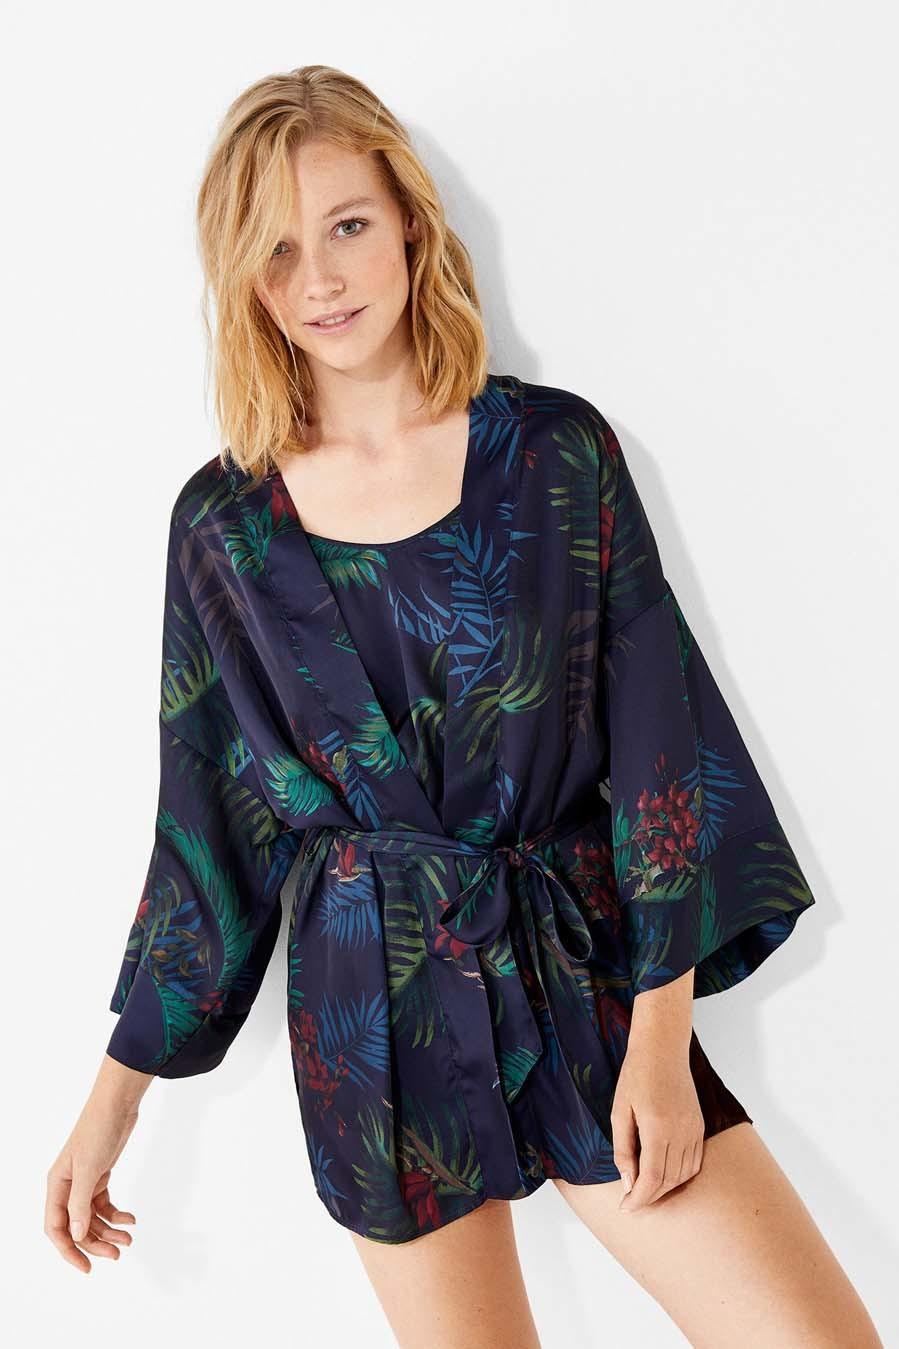 Bata kimono estampada en tonos azules y verdes (19,99 euros).